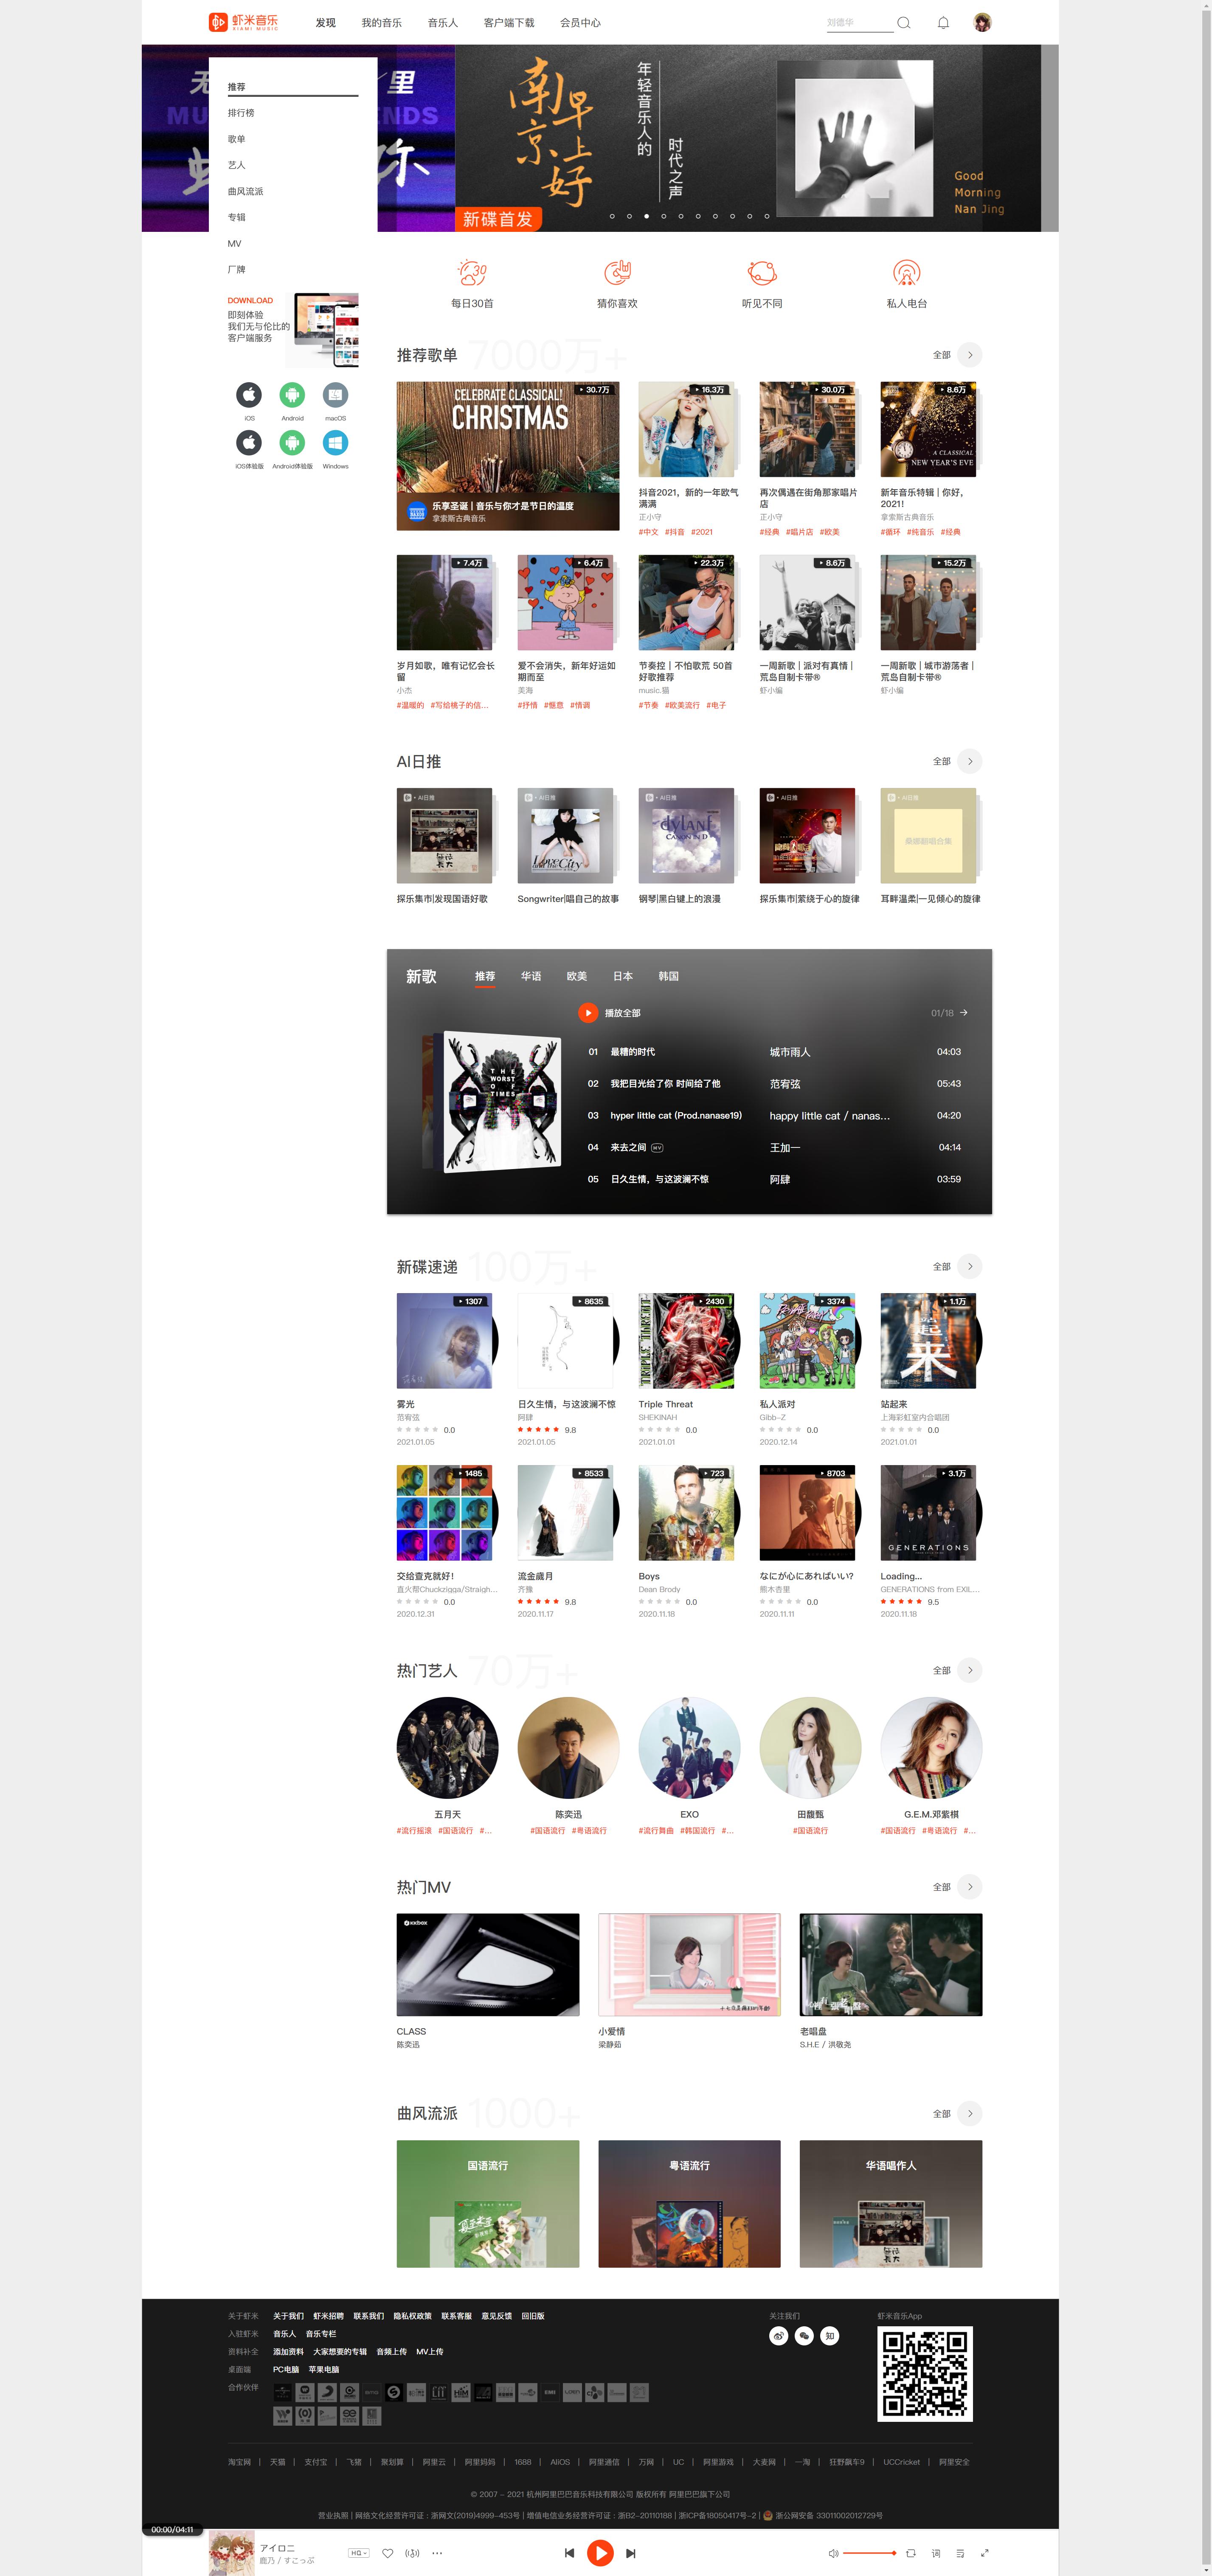 《xiami音乐宣布停止服务》